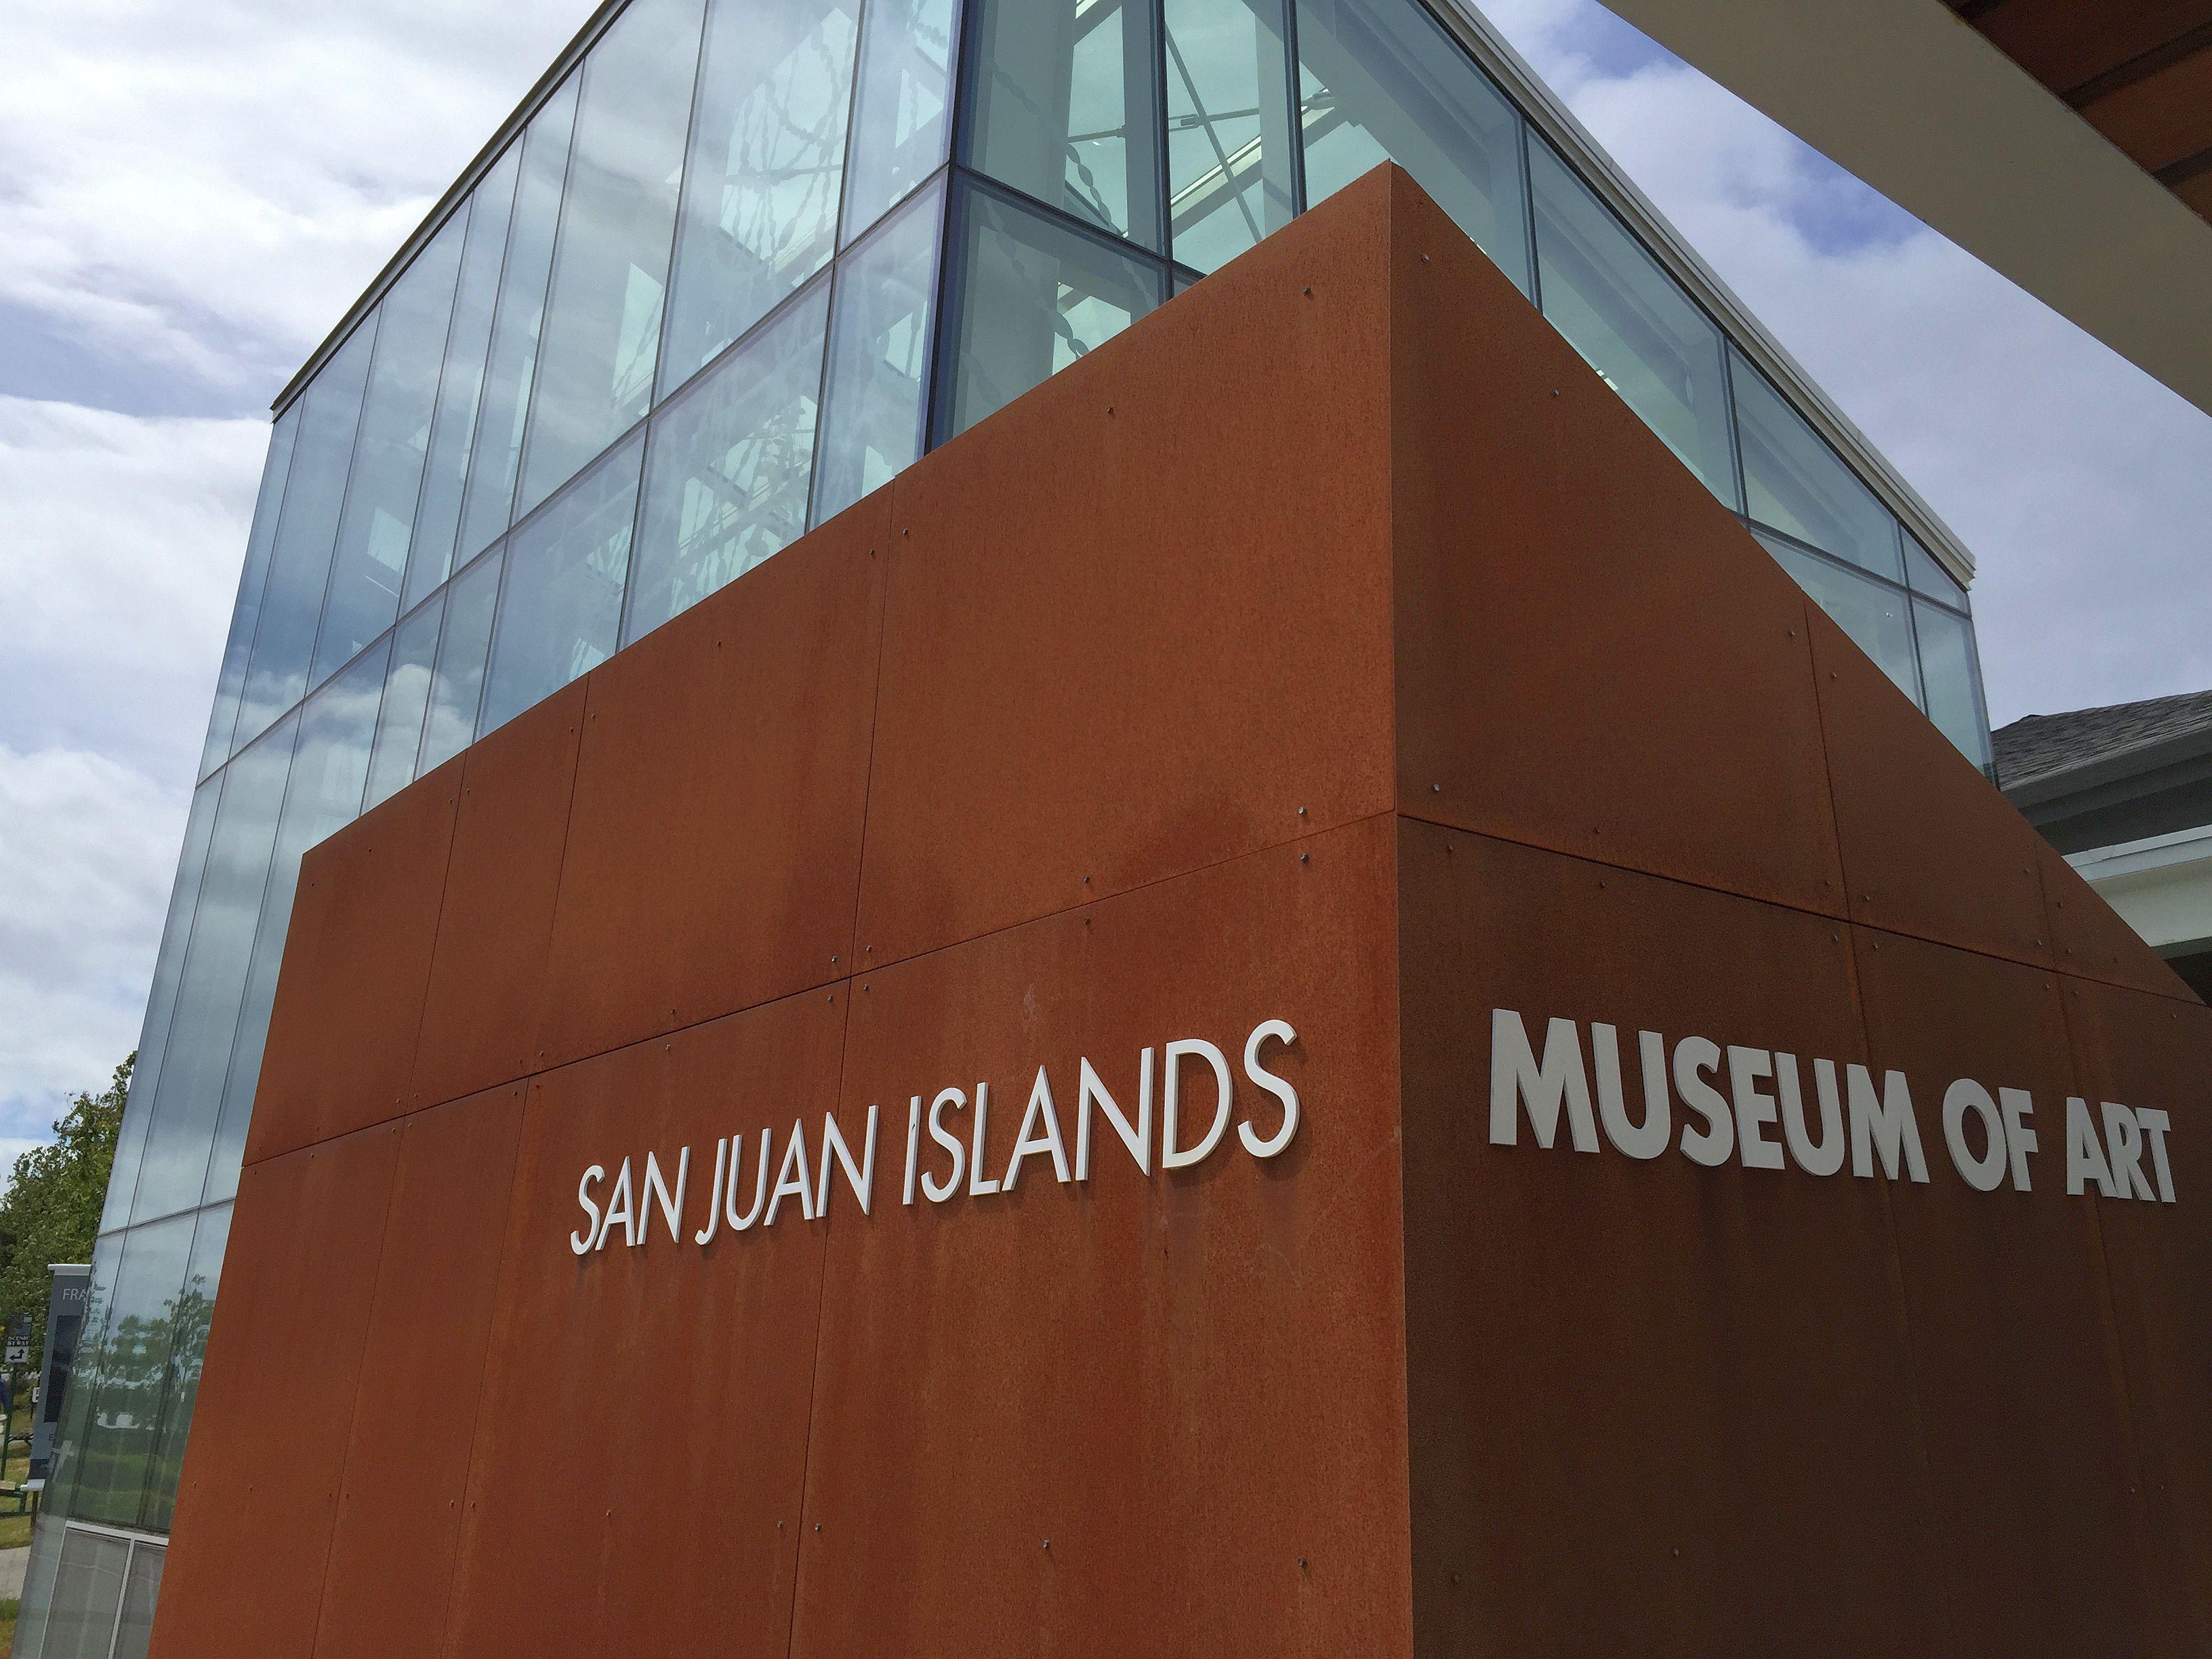 San Juan Island Museum of Art